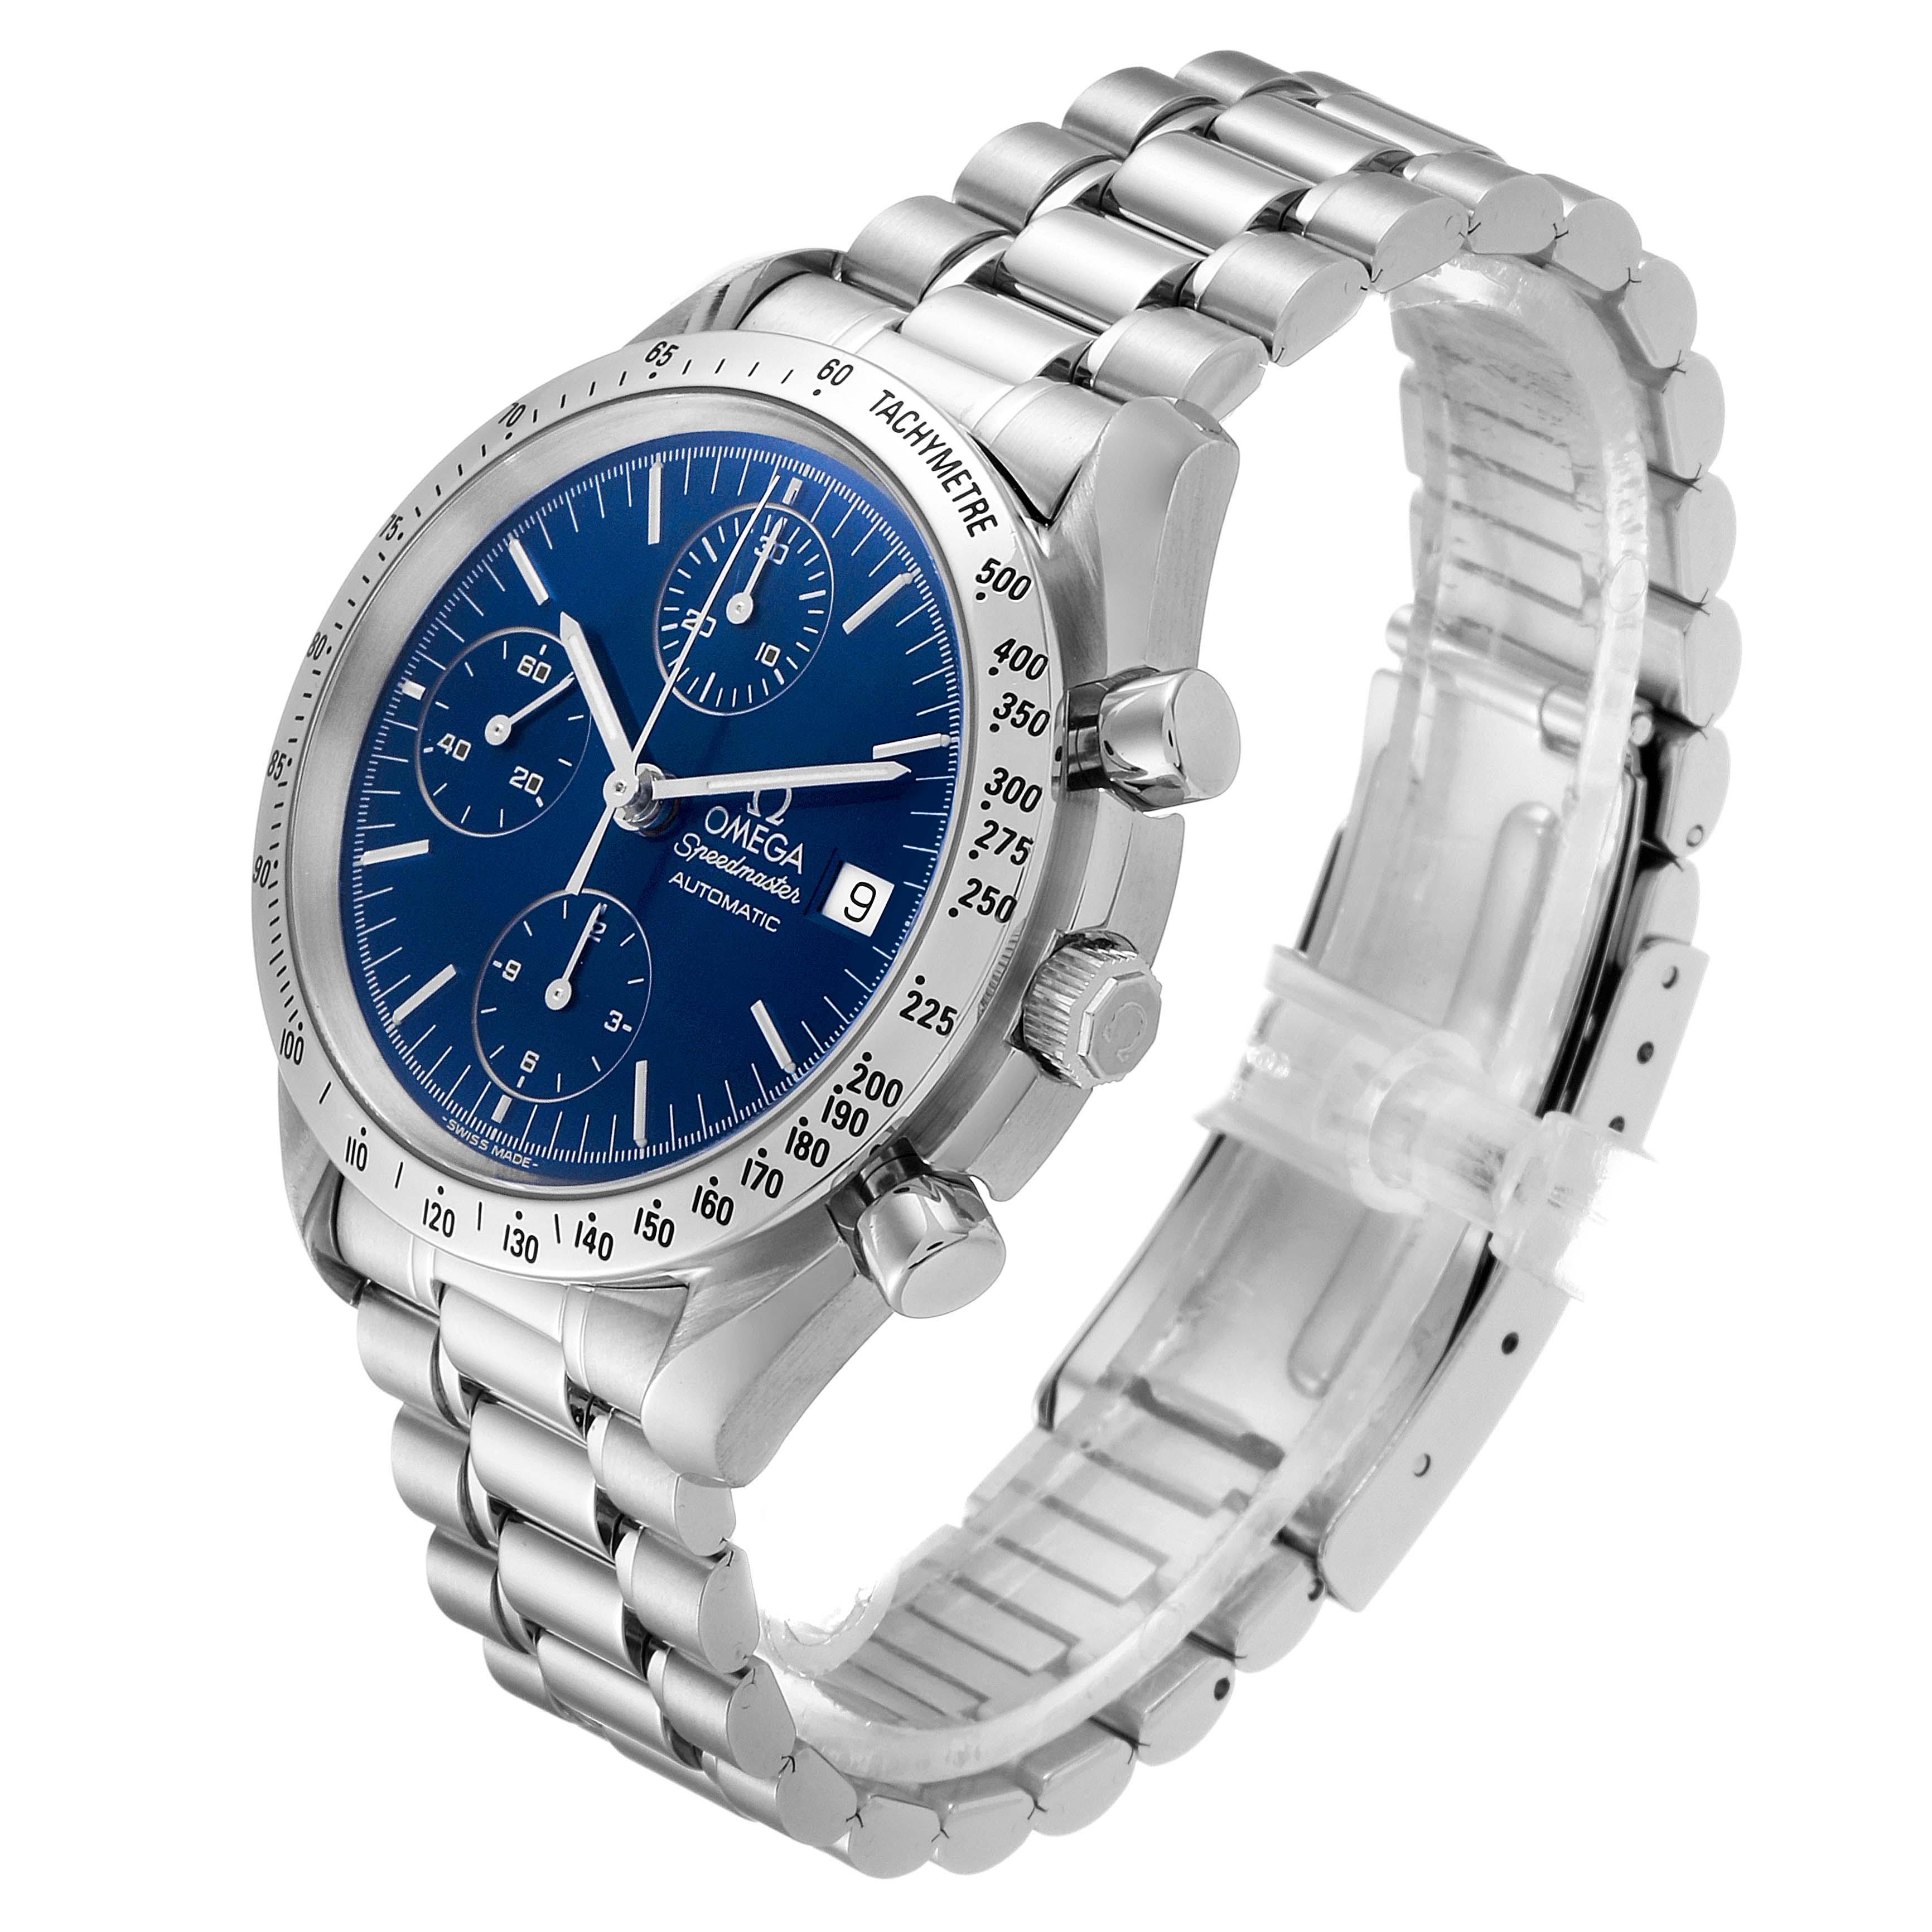 Omega Speedmaster Date Blue Dial Chronograph Mens Watch 3511.80.00 SwissWatchExpo